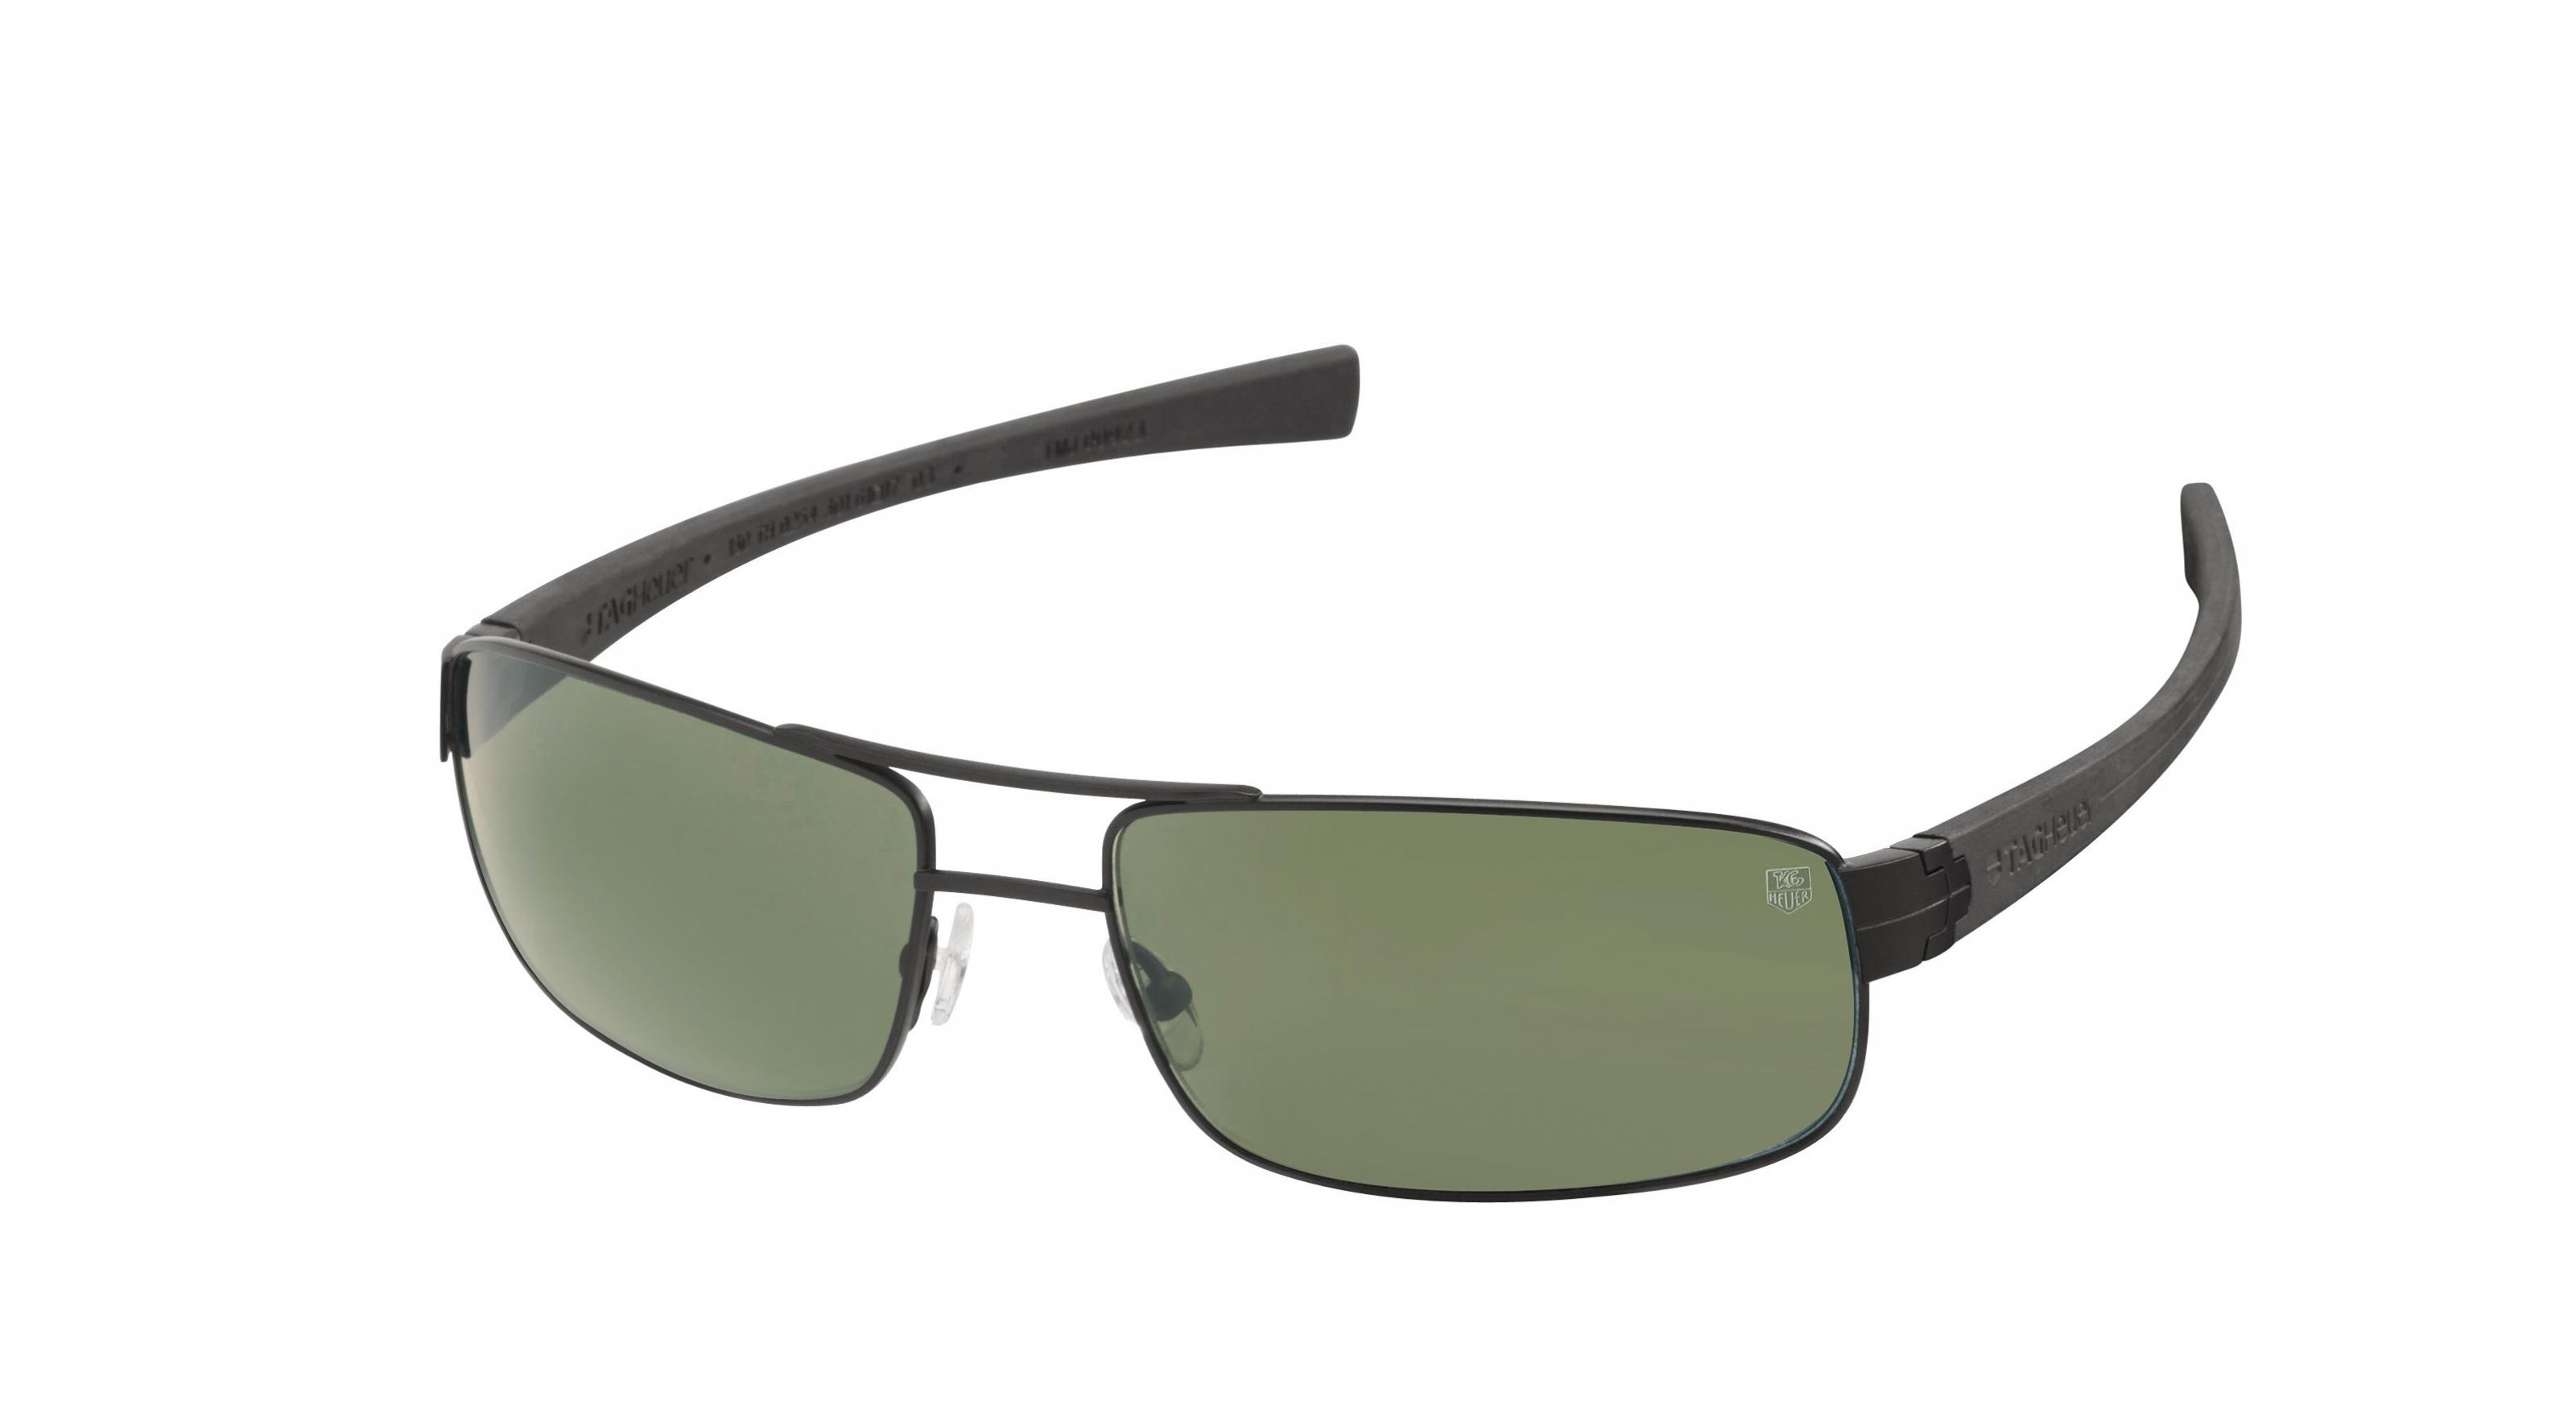 3a6b644986 Tag Heuer 0254 Lrs Sunglasses